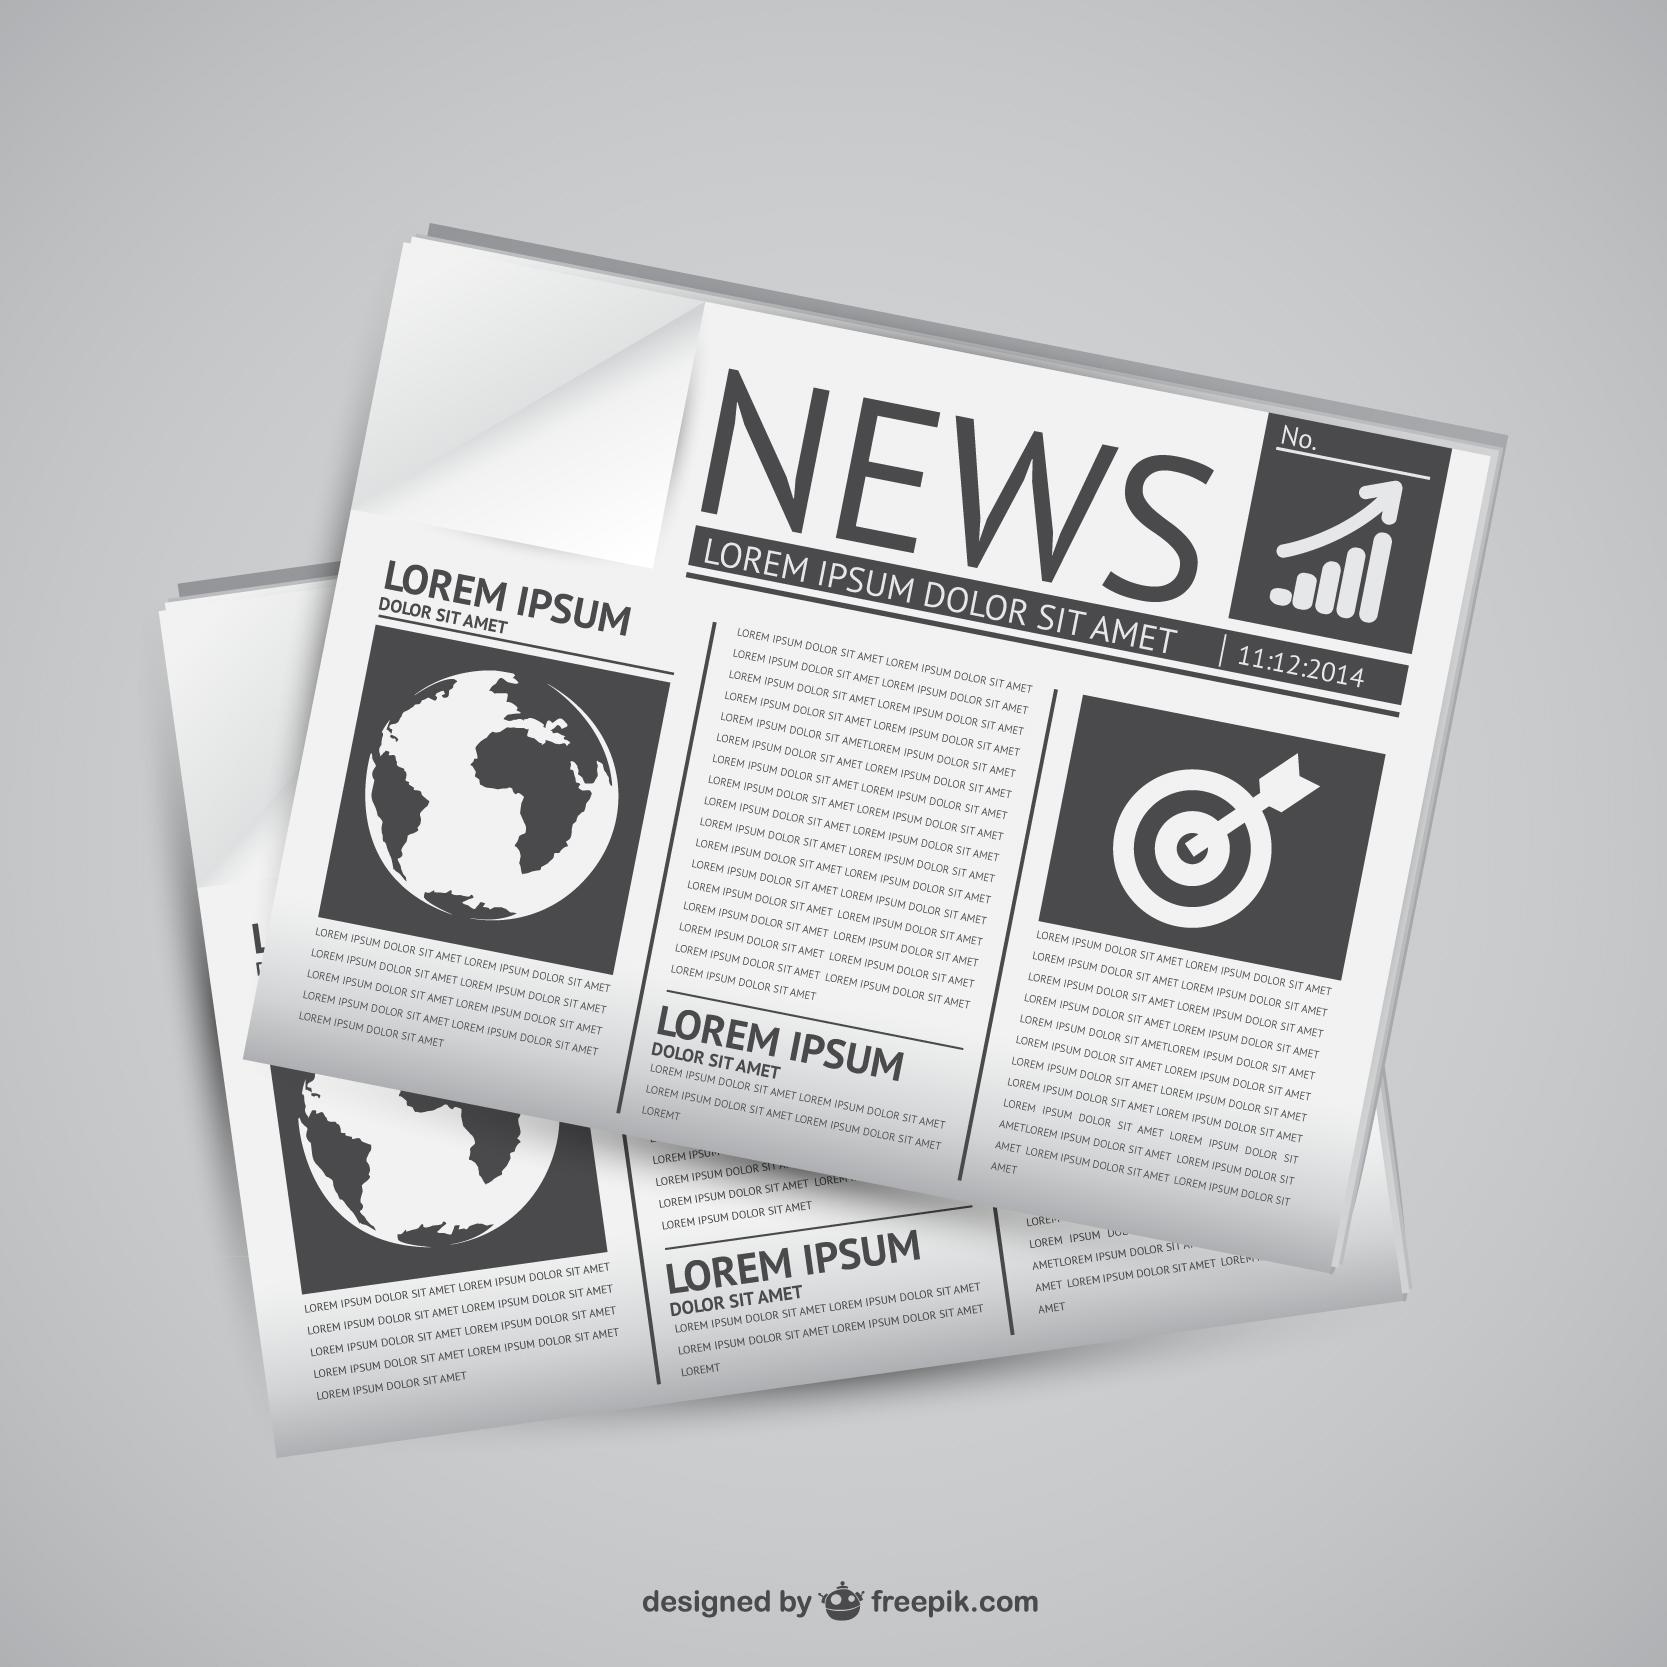 news paper1.jpg